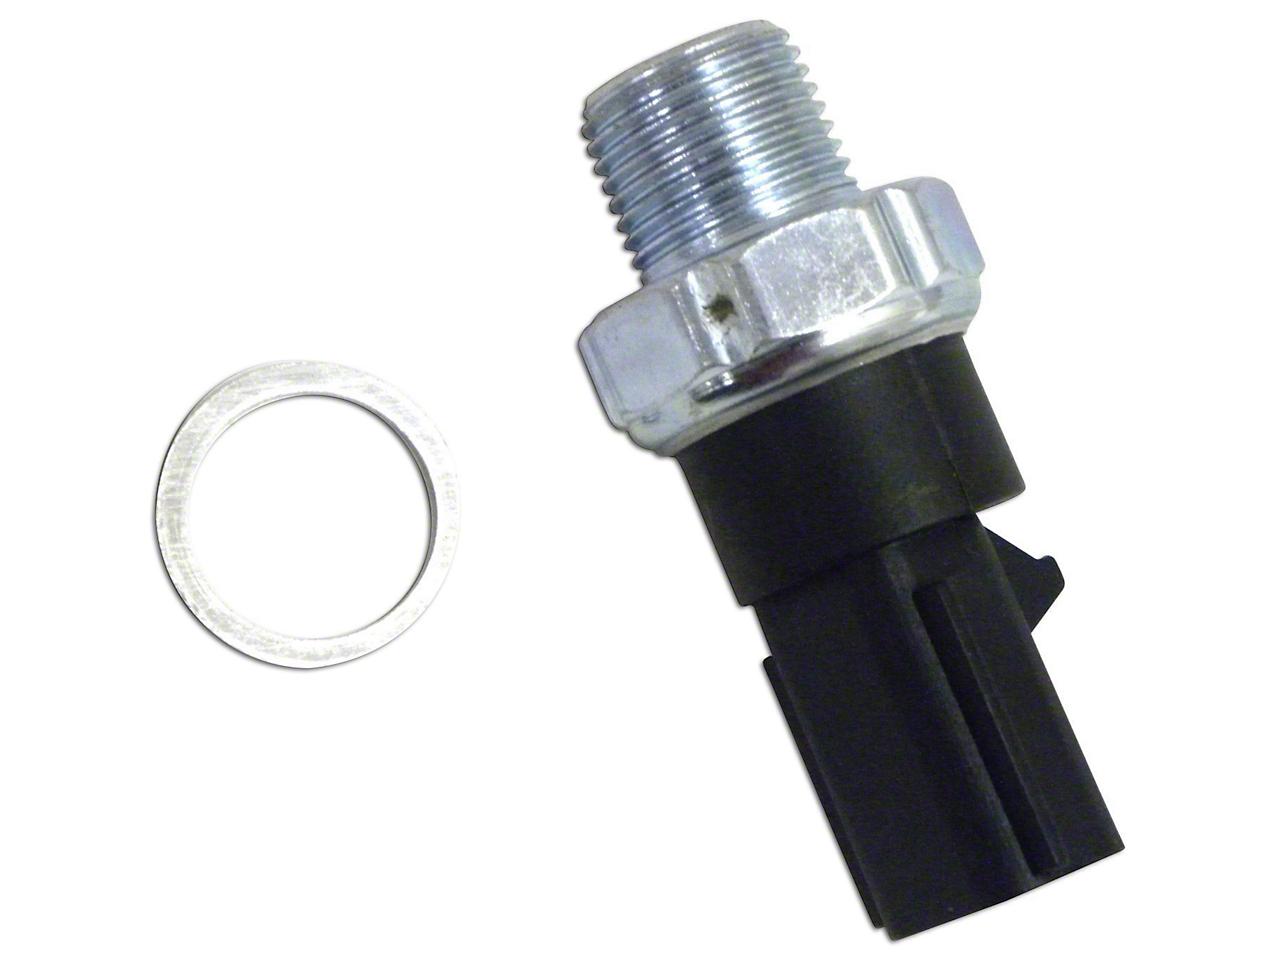 Oil Pressure Switch (03-11 2.4L or 3.8L Jeep Wrangler TJ & JK)